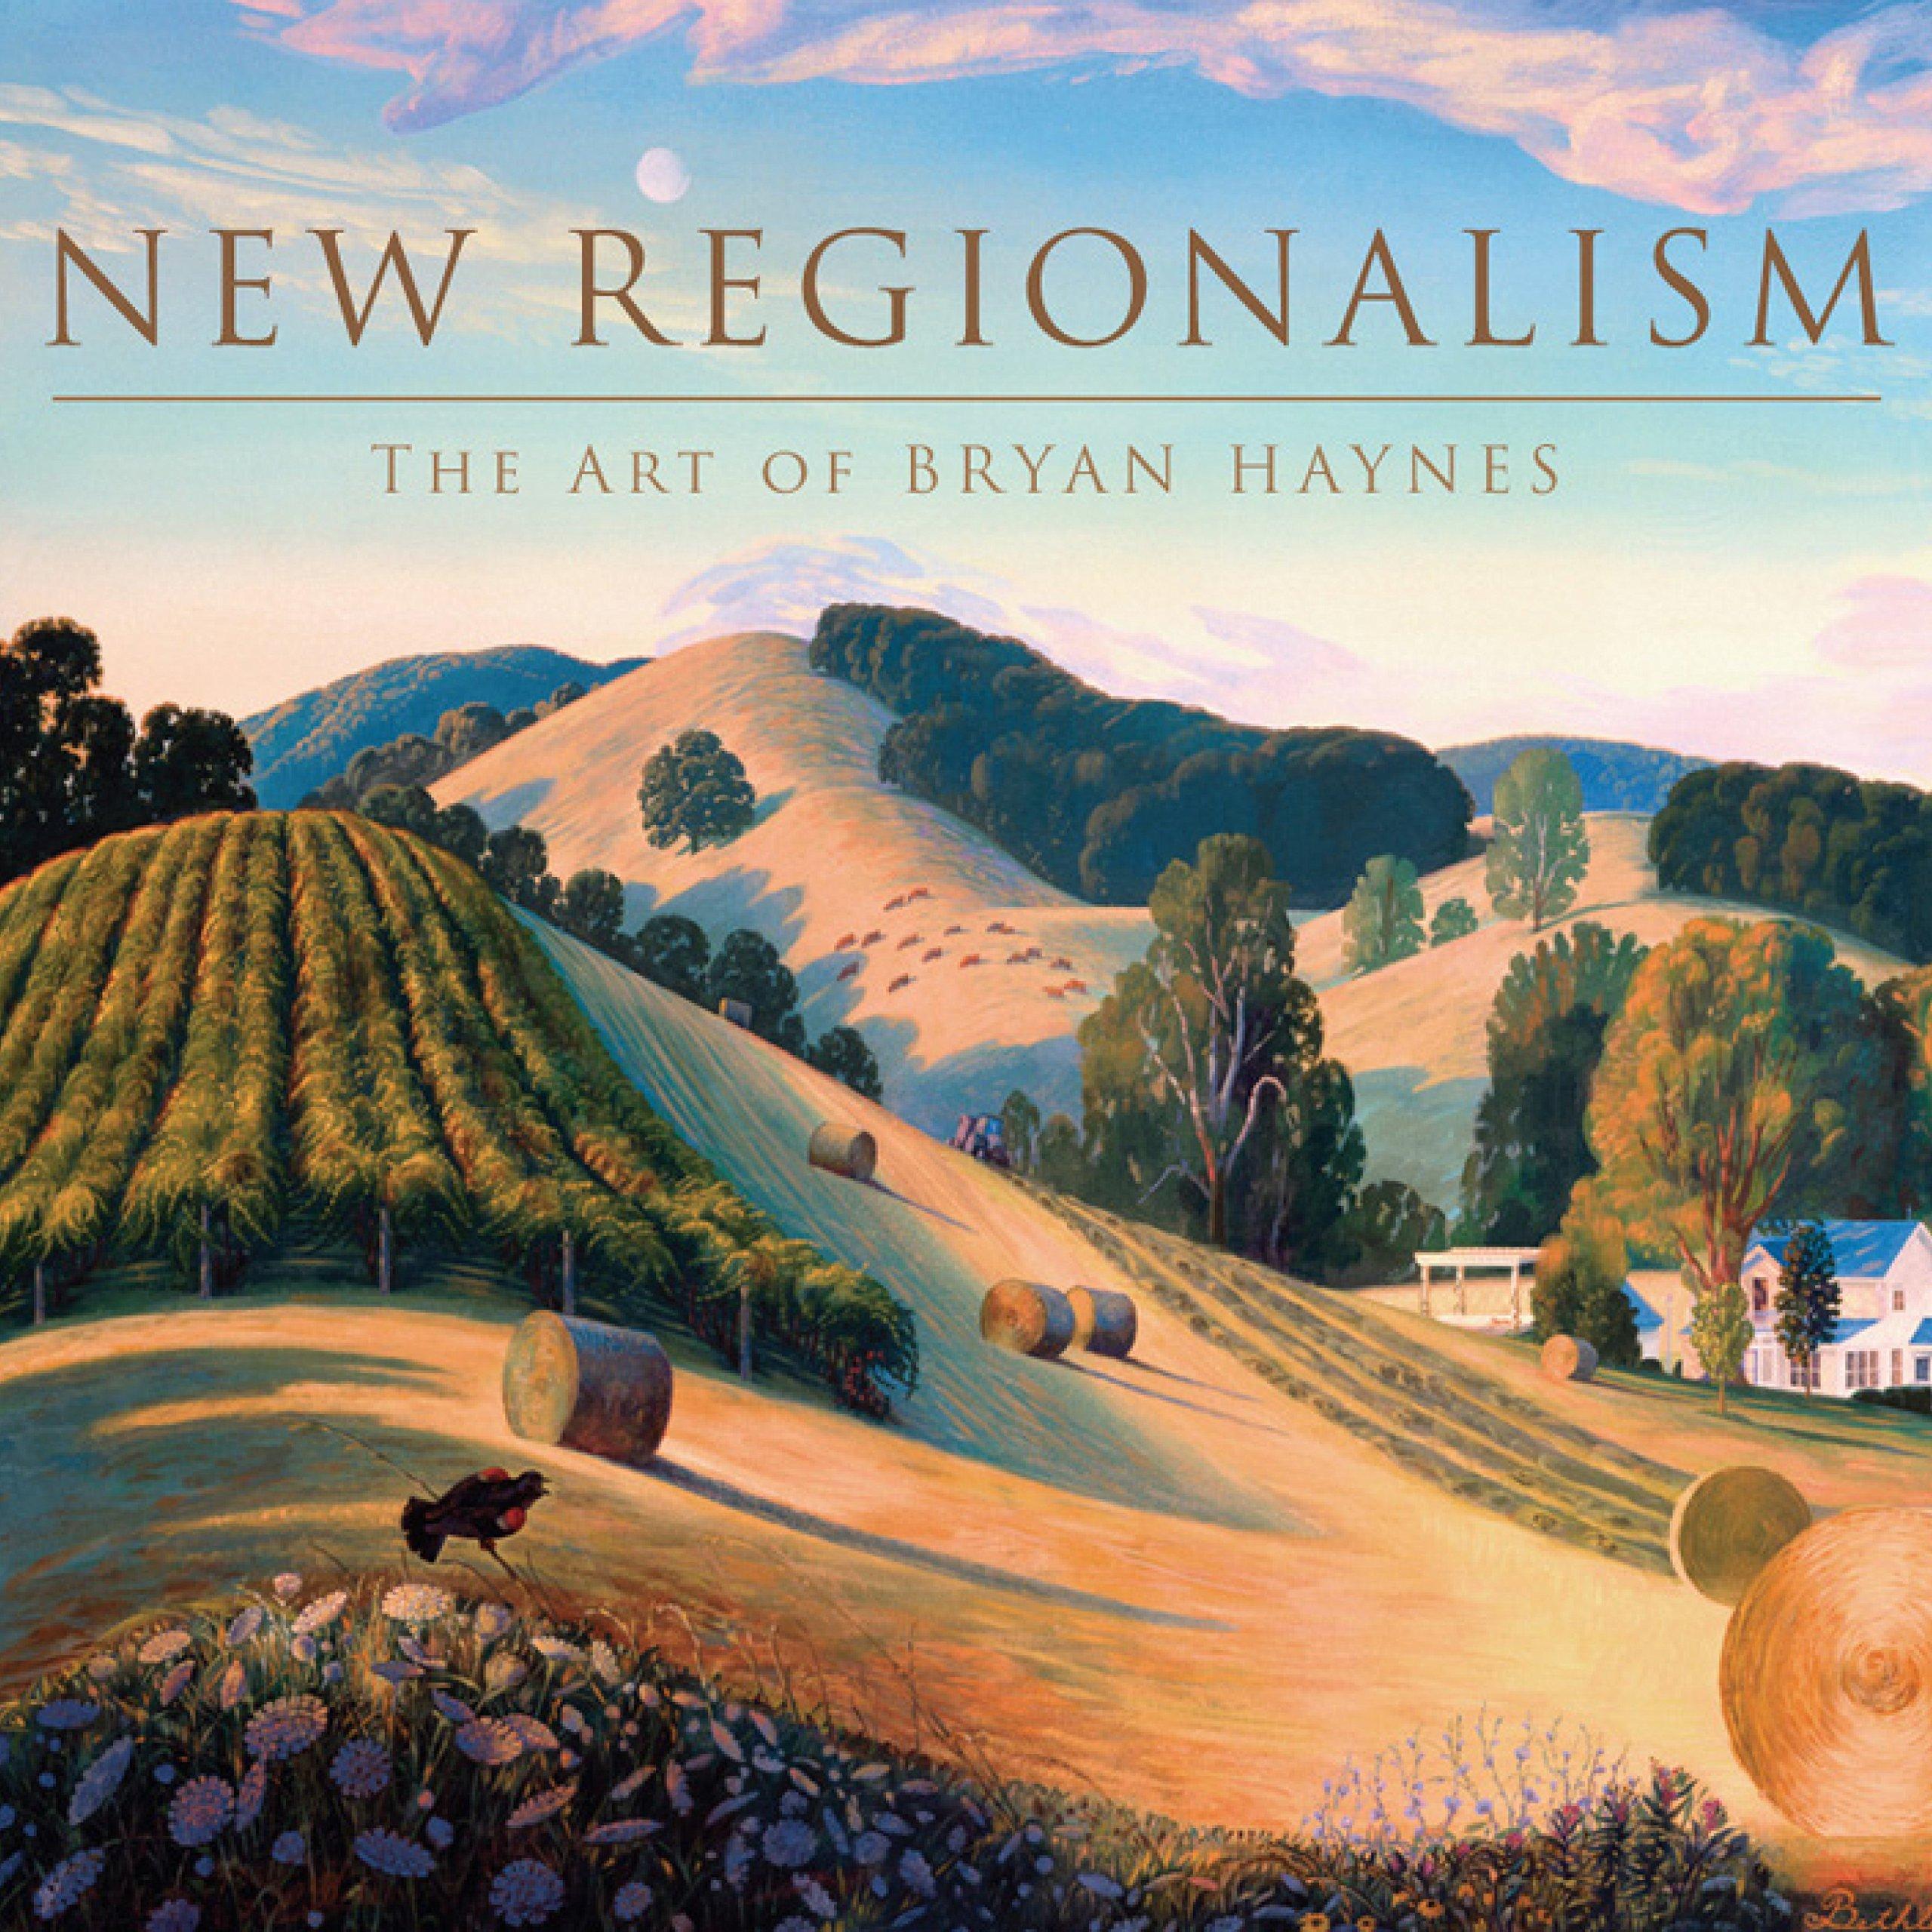 New Regionalism: The Art of Bryan Haynes pdf